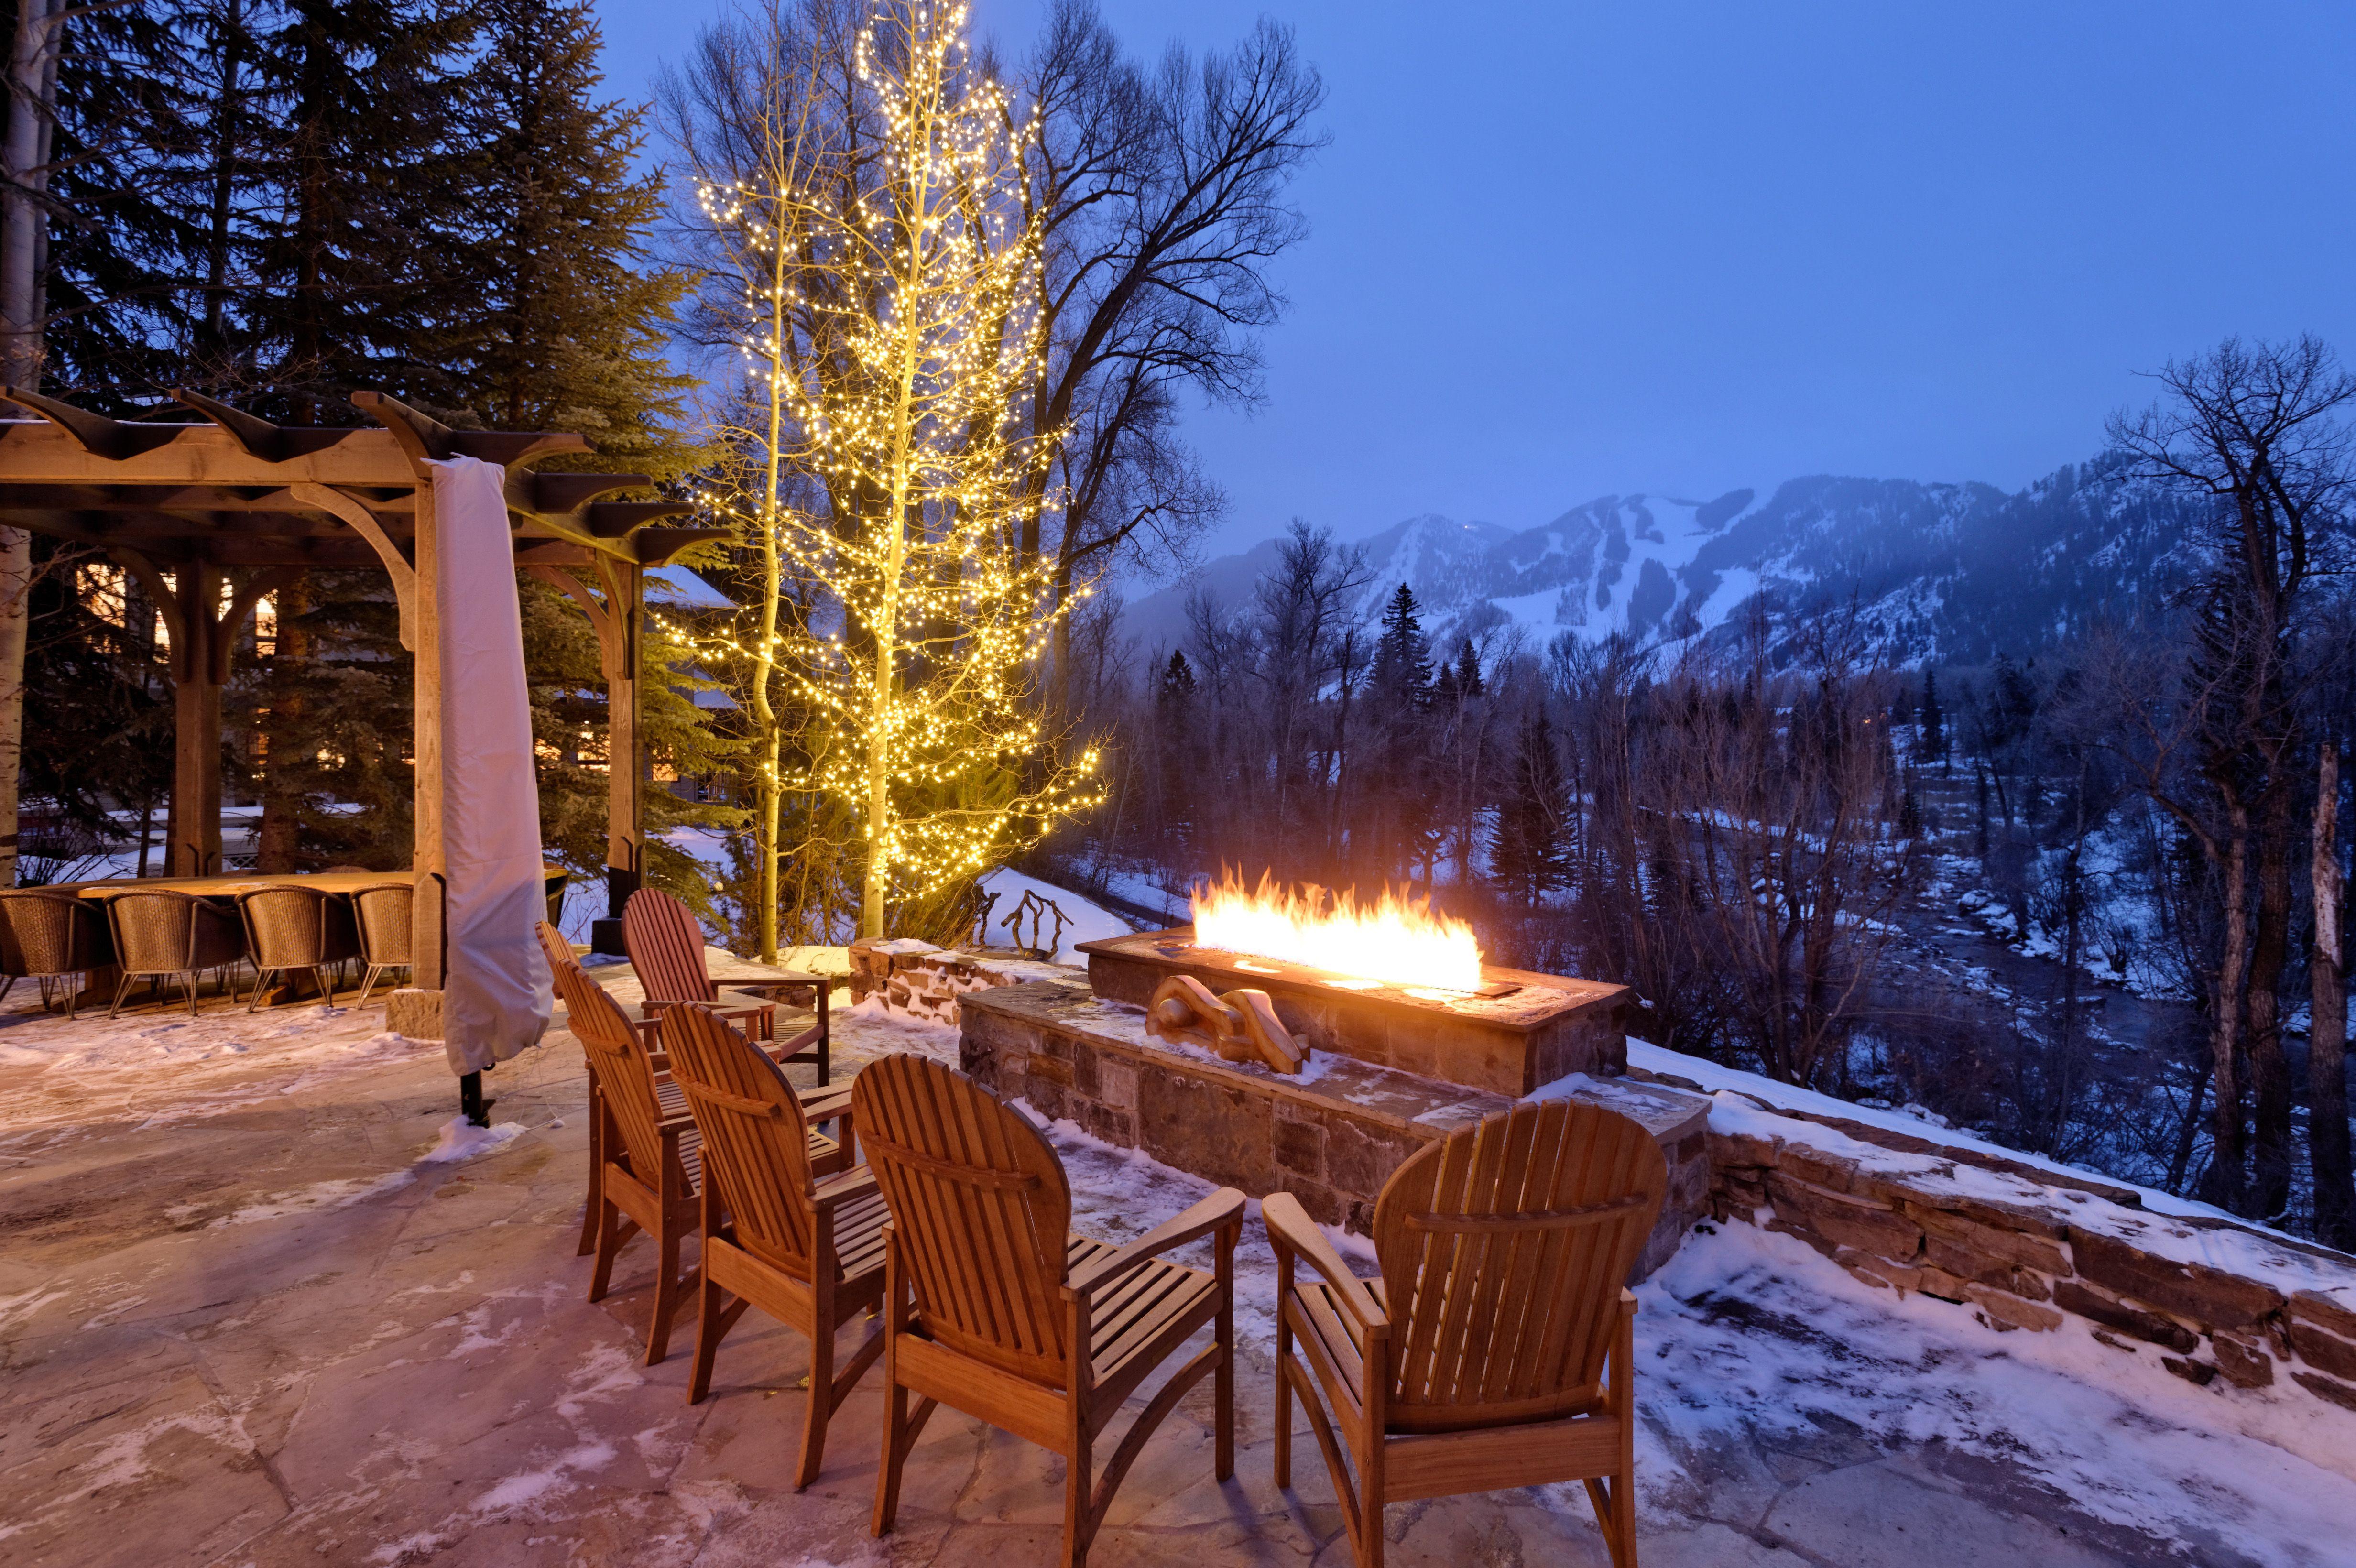 Aspen 39 log cabin 39 winter firepit at night aspen co for Colorado cabin winter